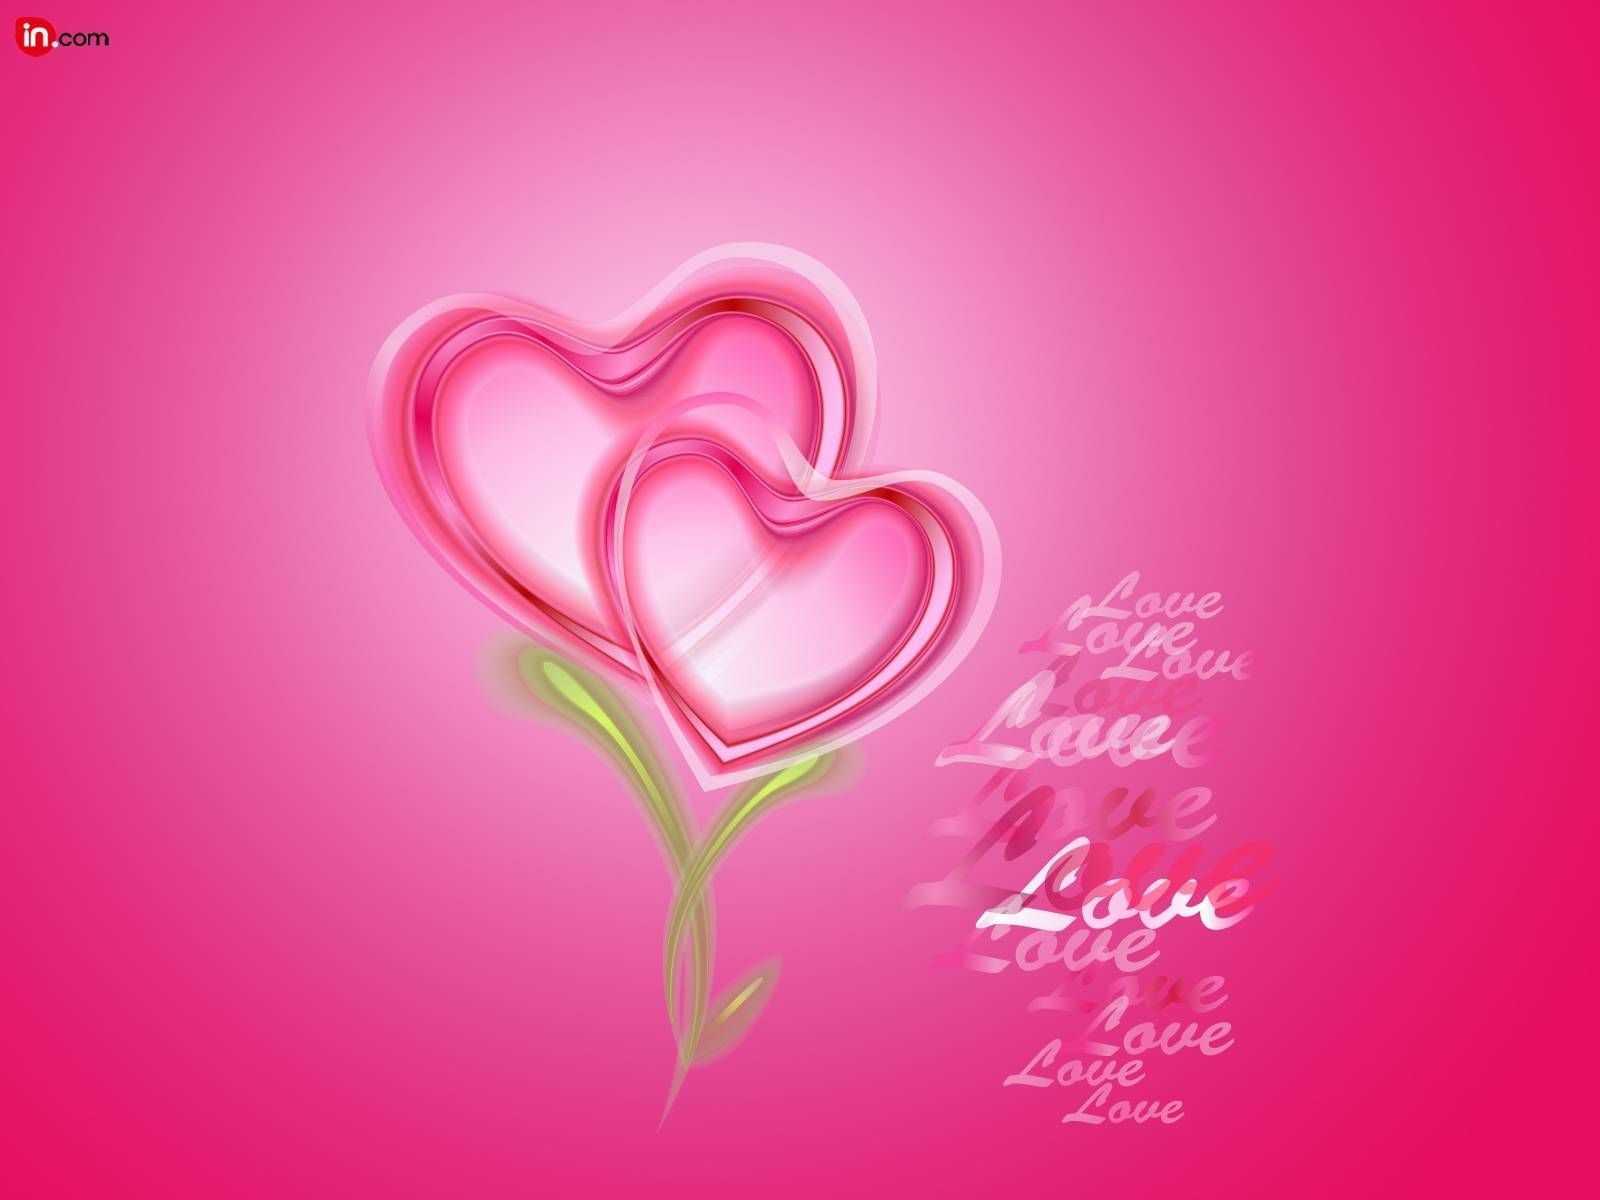 I Love U Wallpaper Free Download I Love U Wallpaper Good Morning Images With Love Hd 1600x1200 Wallpaper Teahub Io